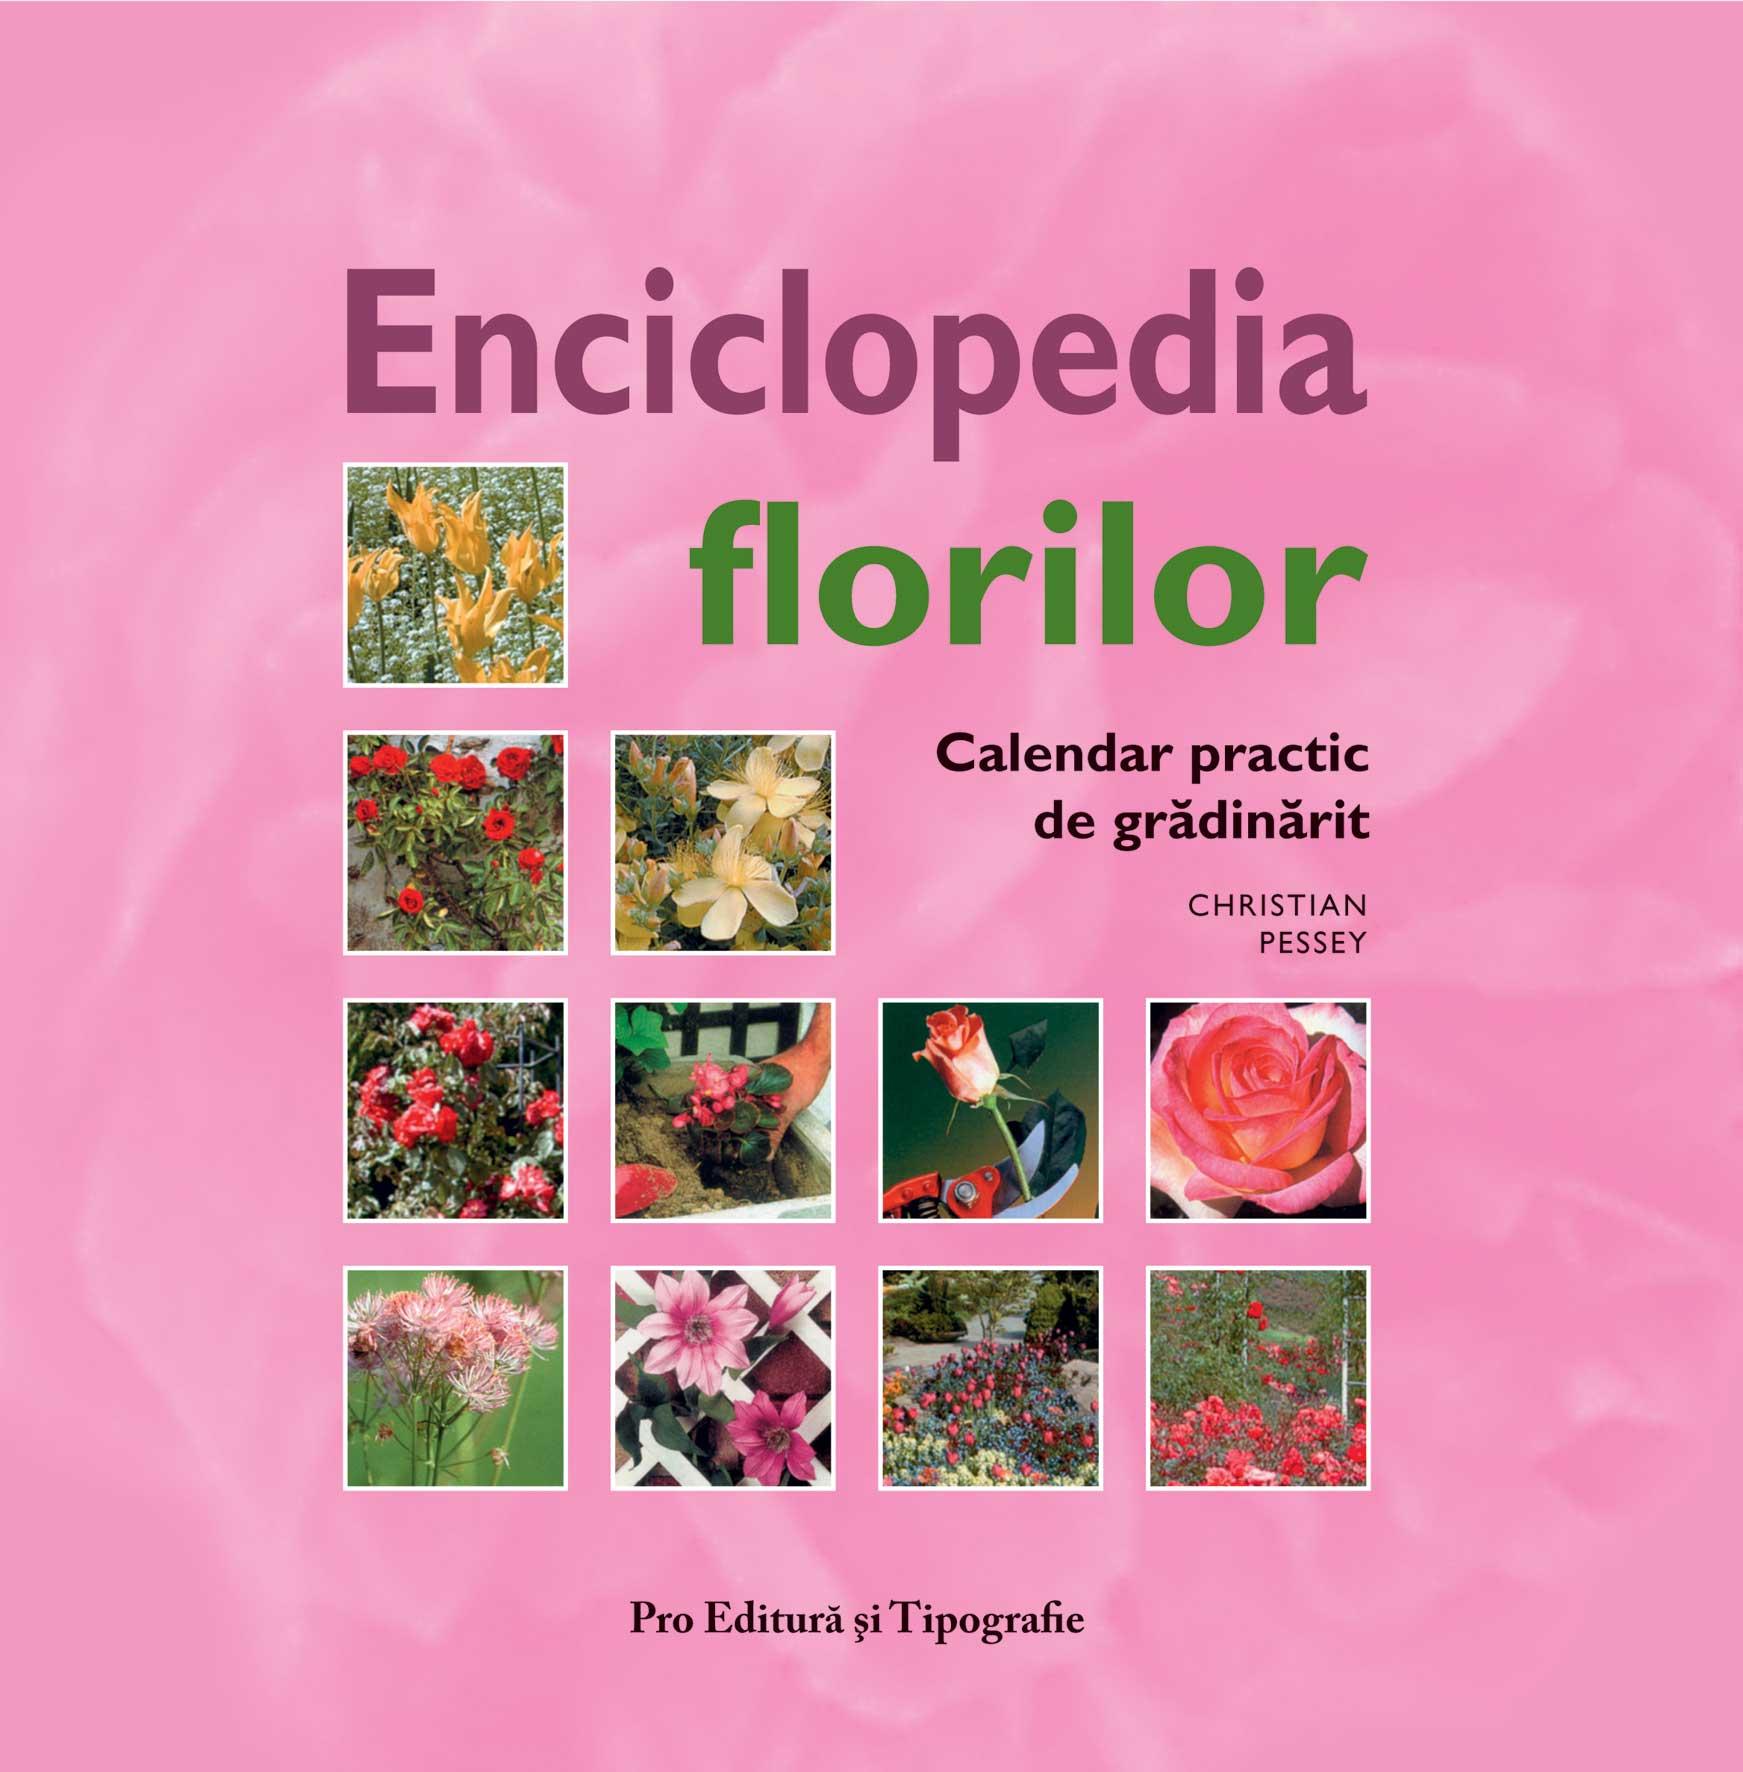 Enciclopedia Florilor